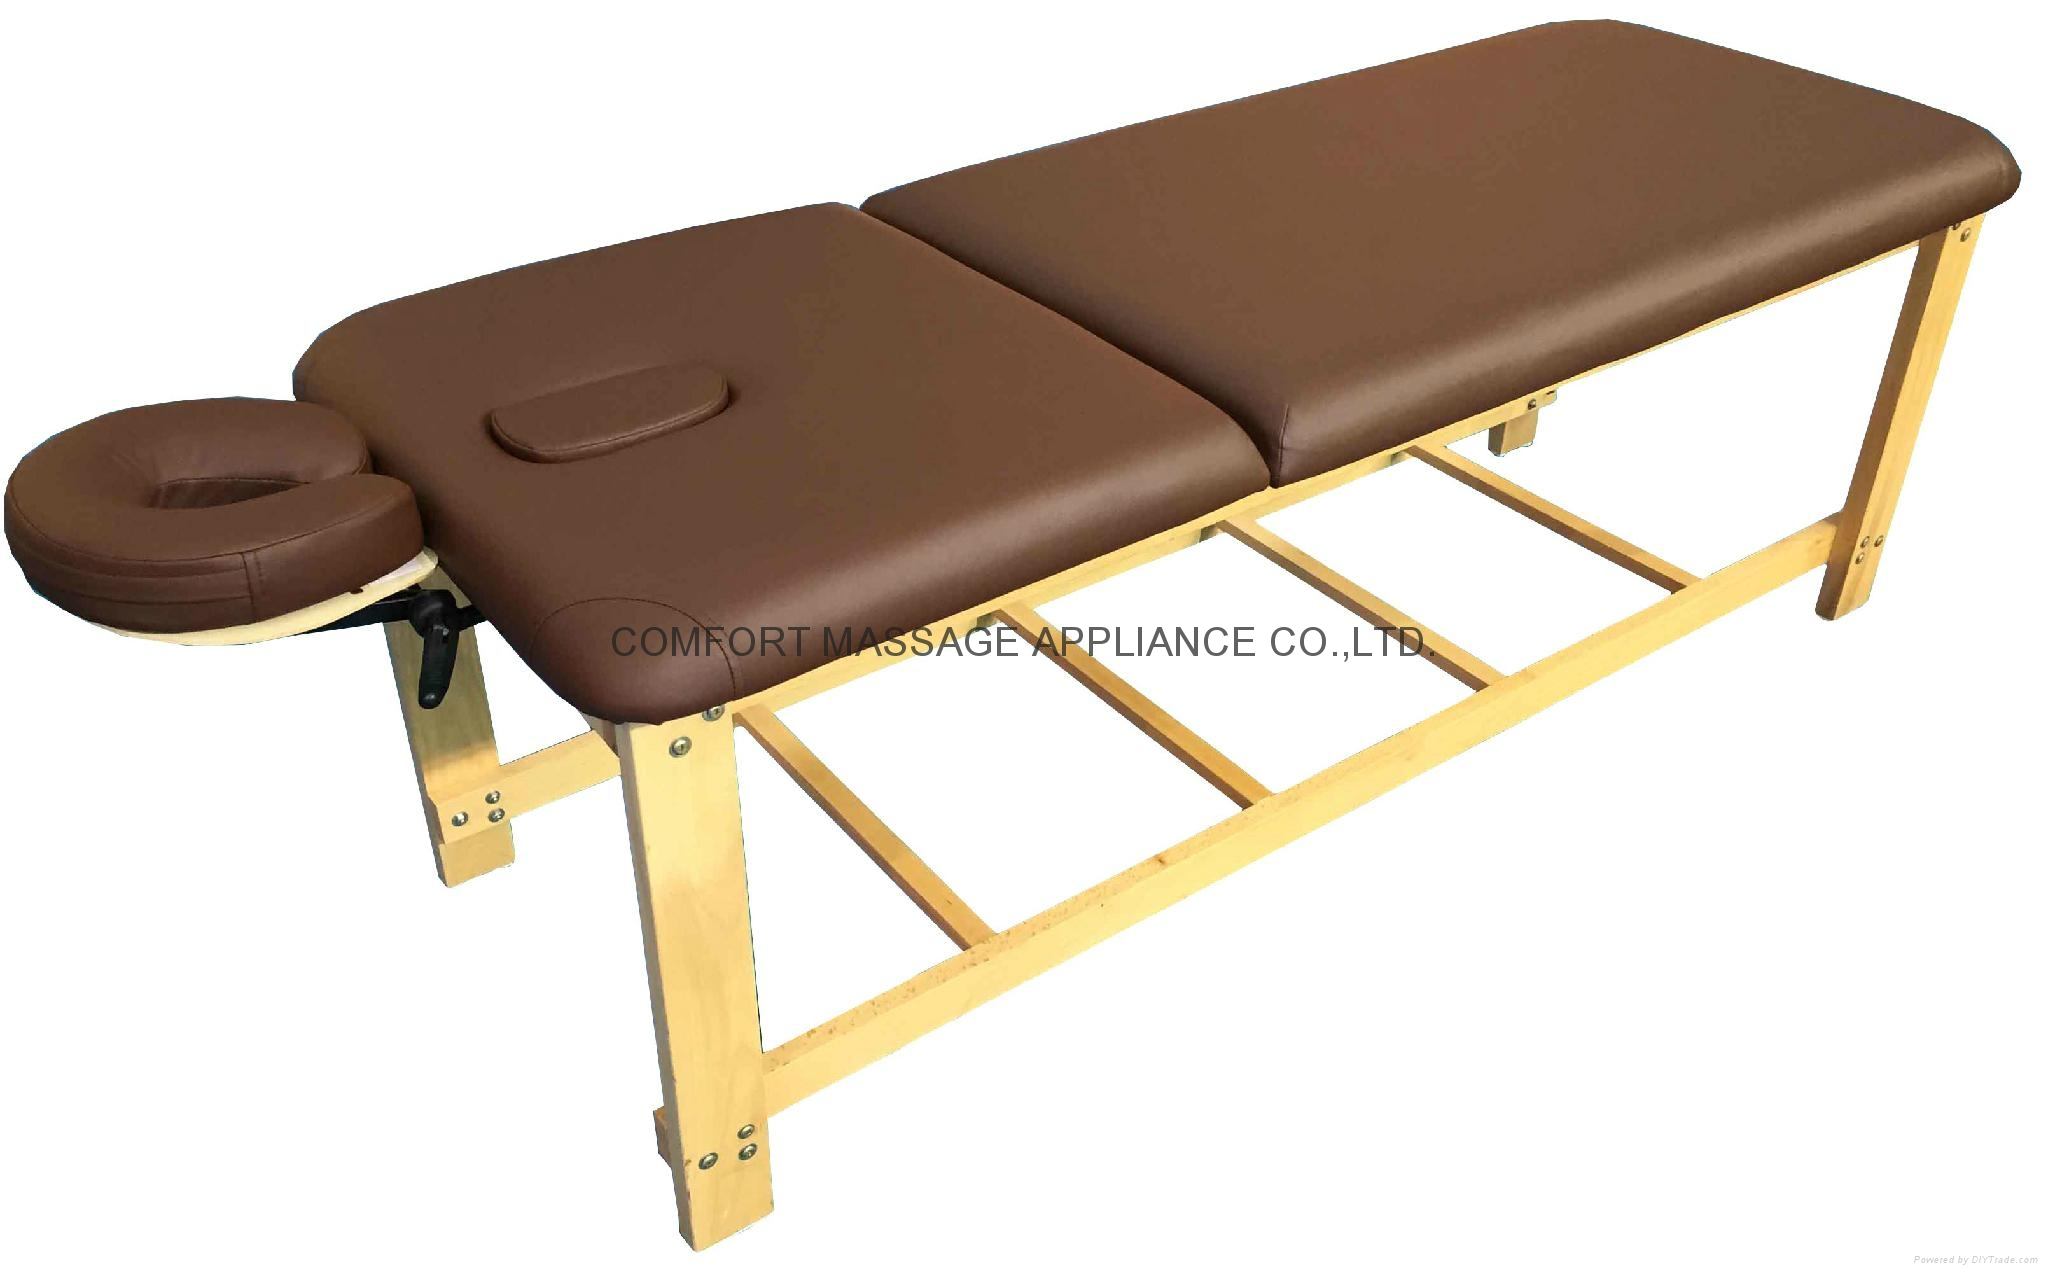 SM-007 disassembled stationary massage table with adjustable backrest 2